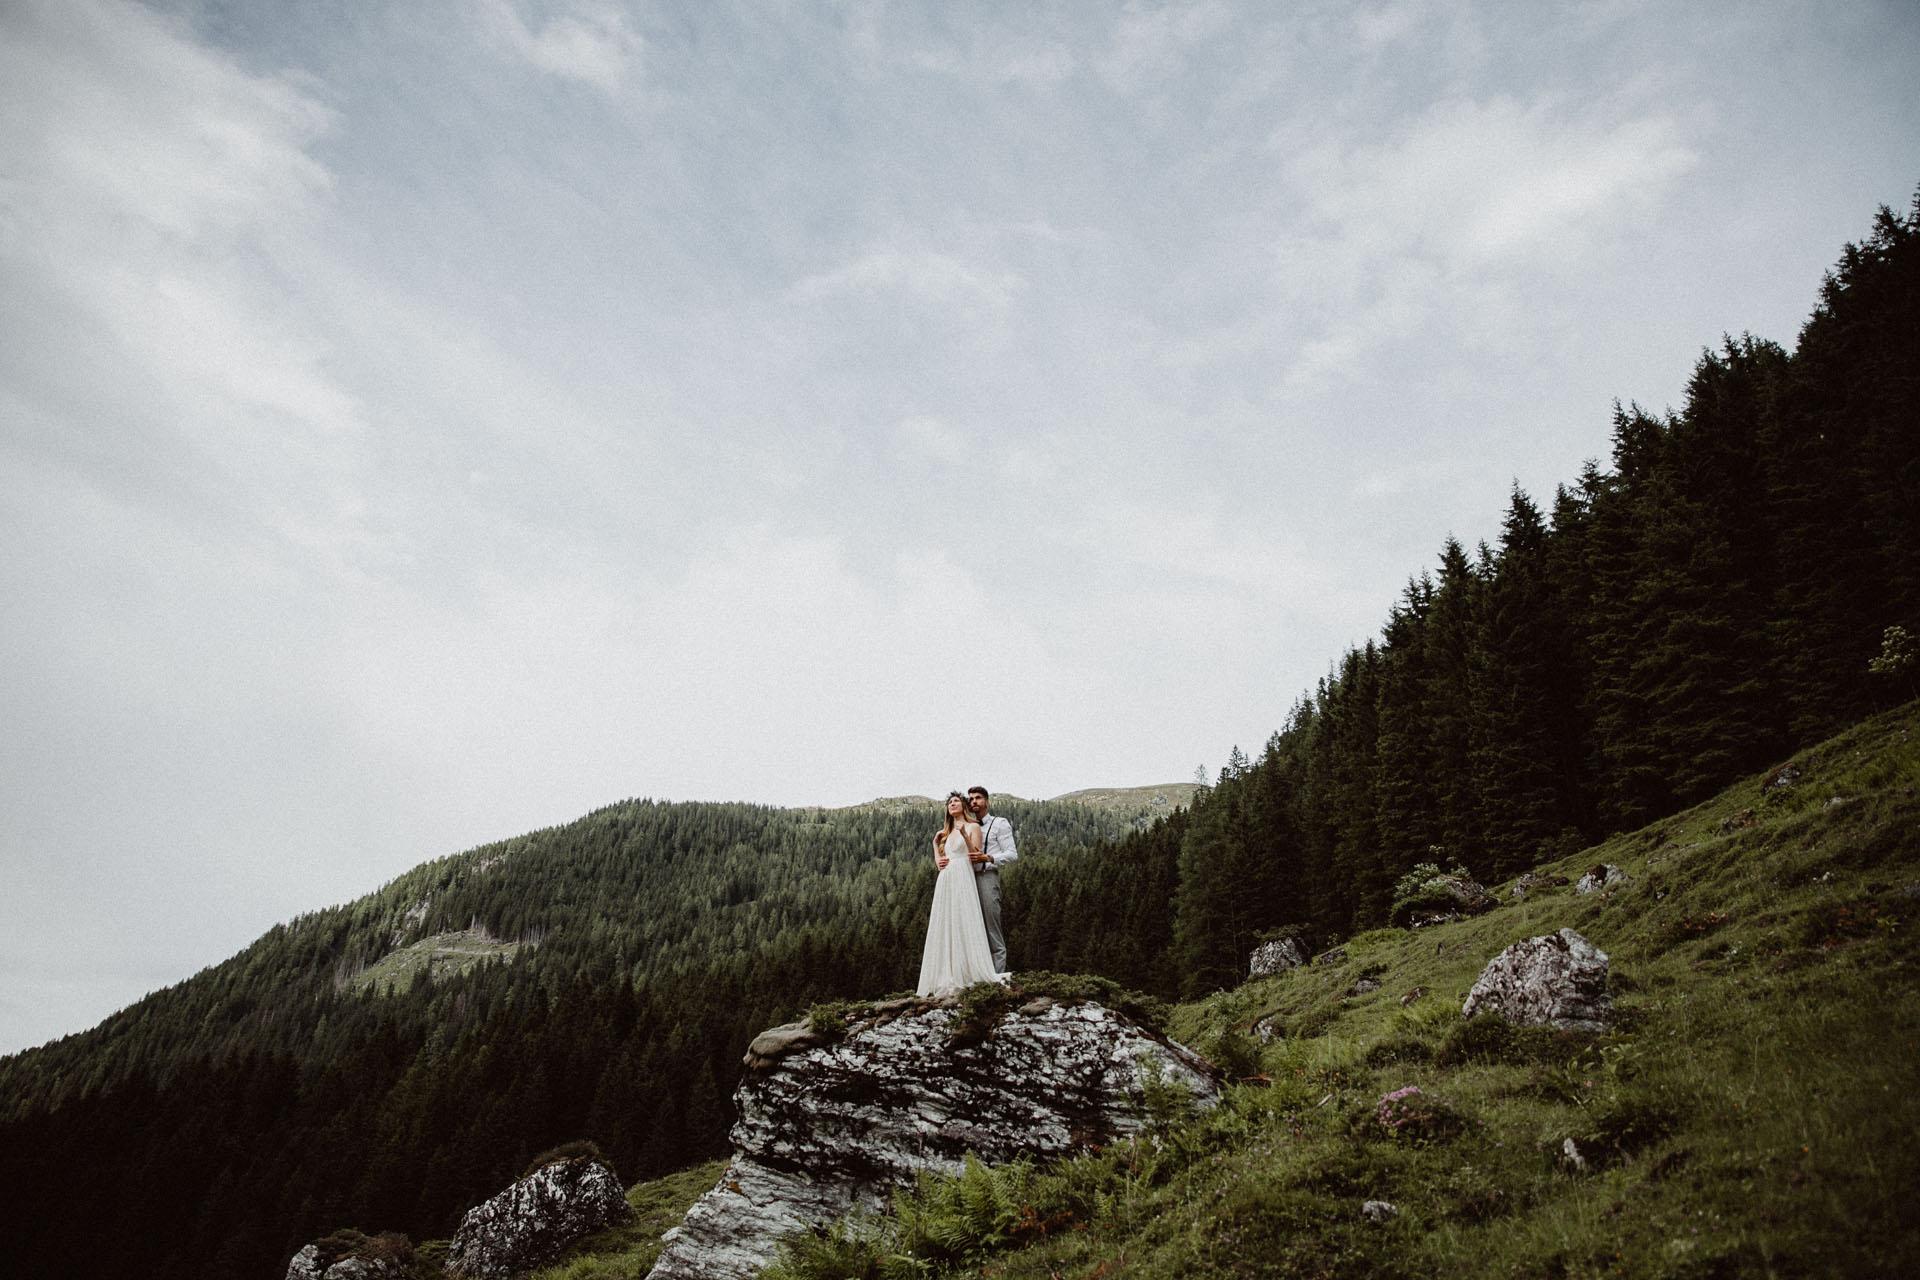 vienna-wedding-photographer-agnesundandi-weddingshooting-schladming-49